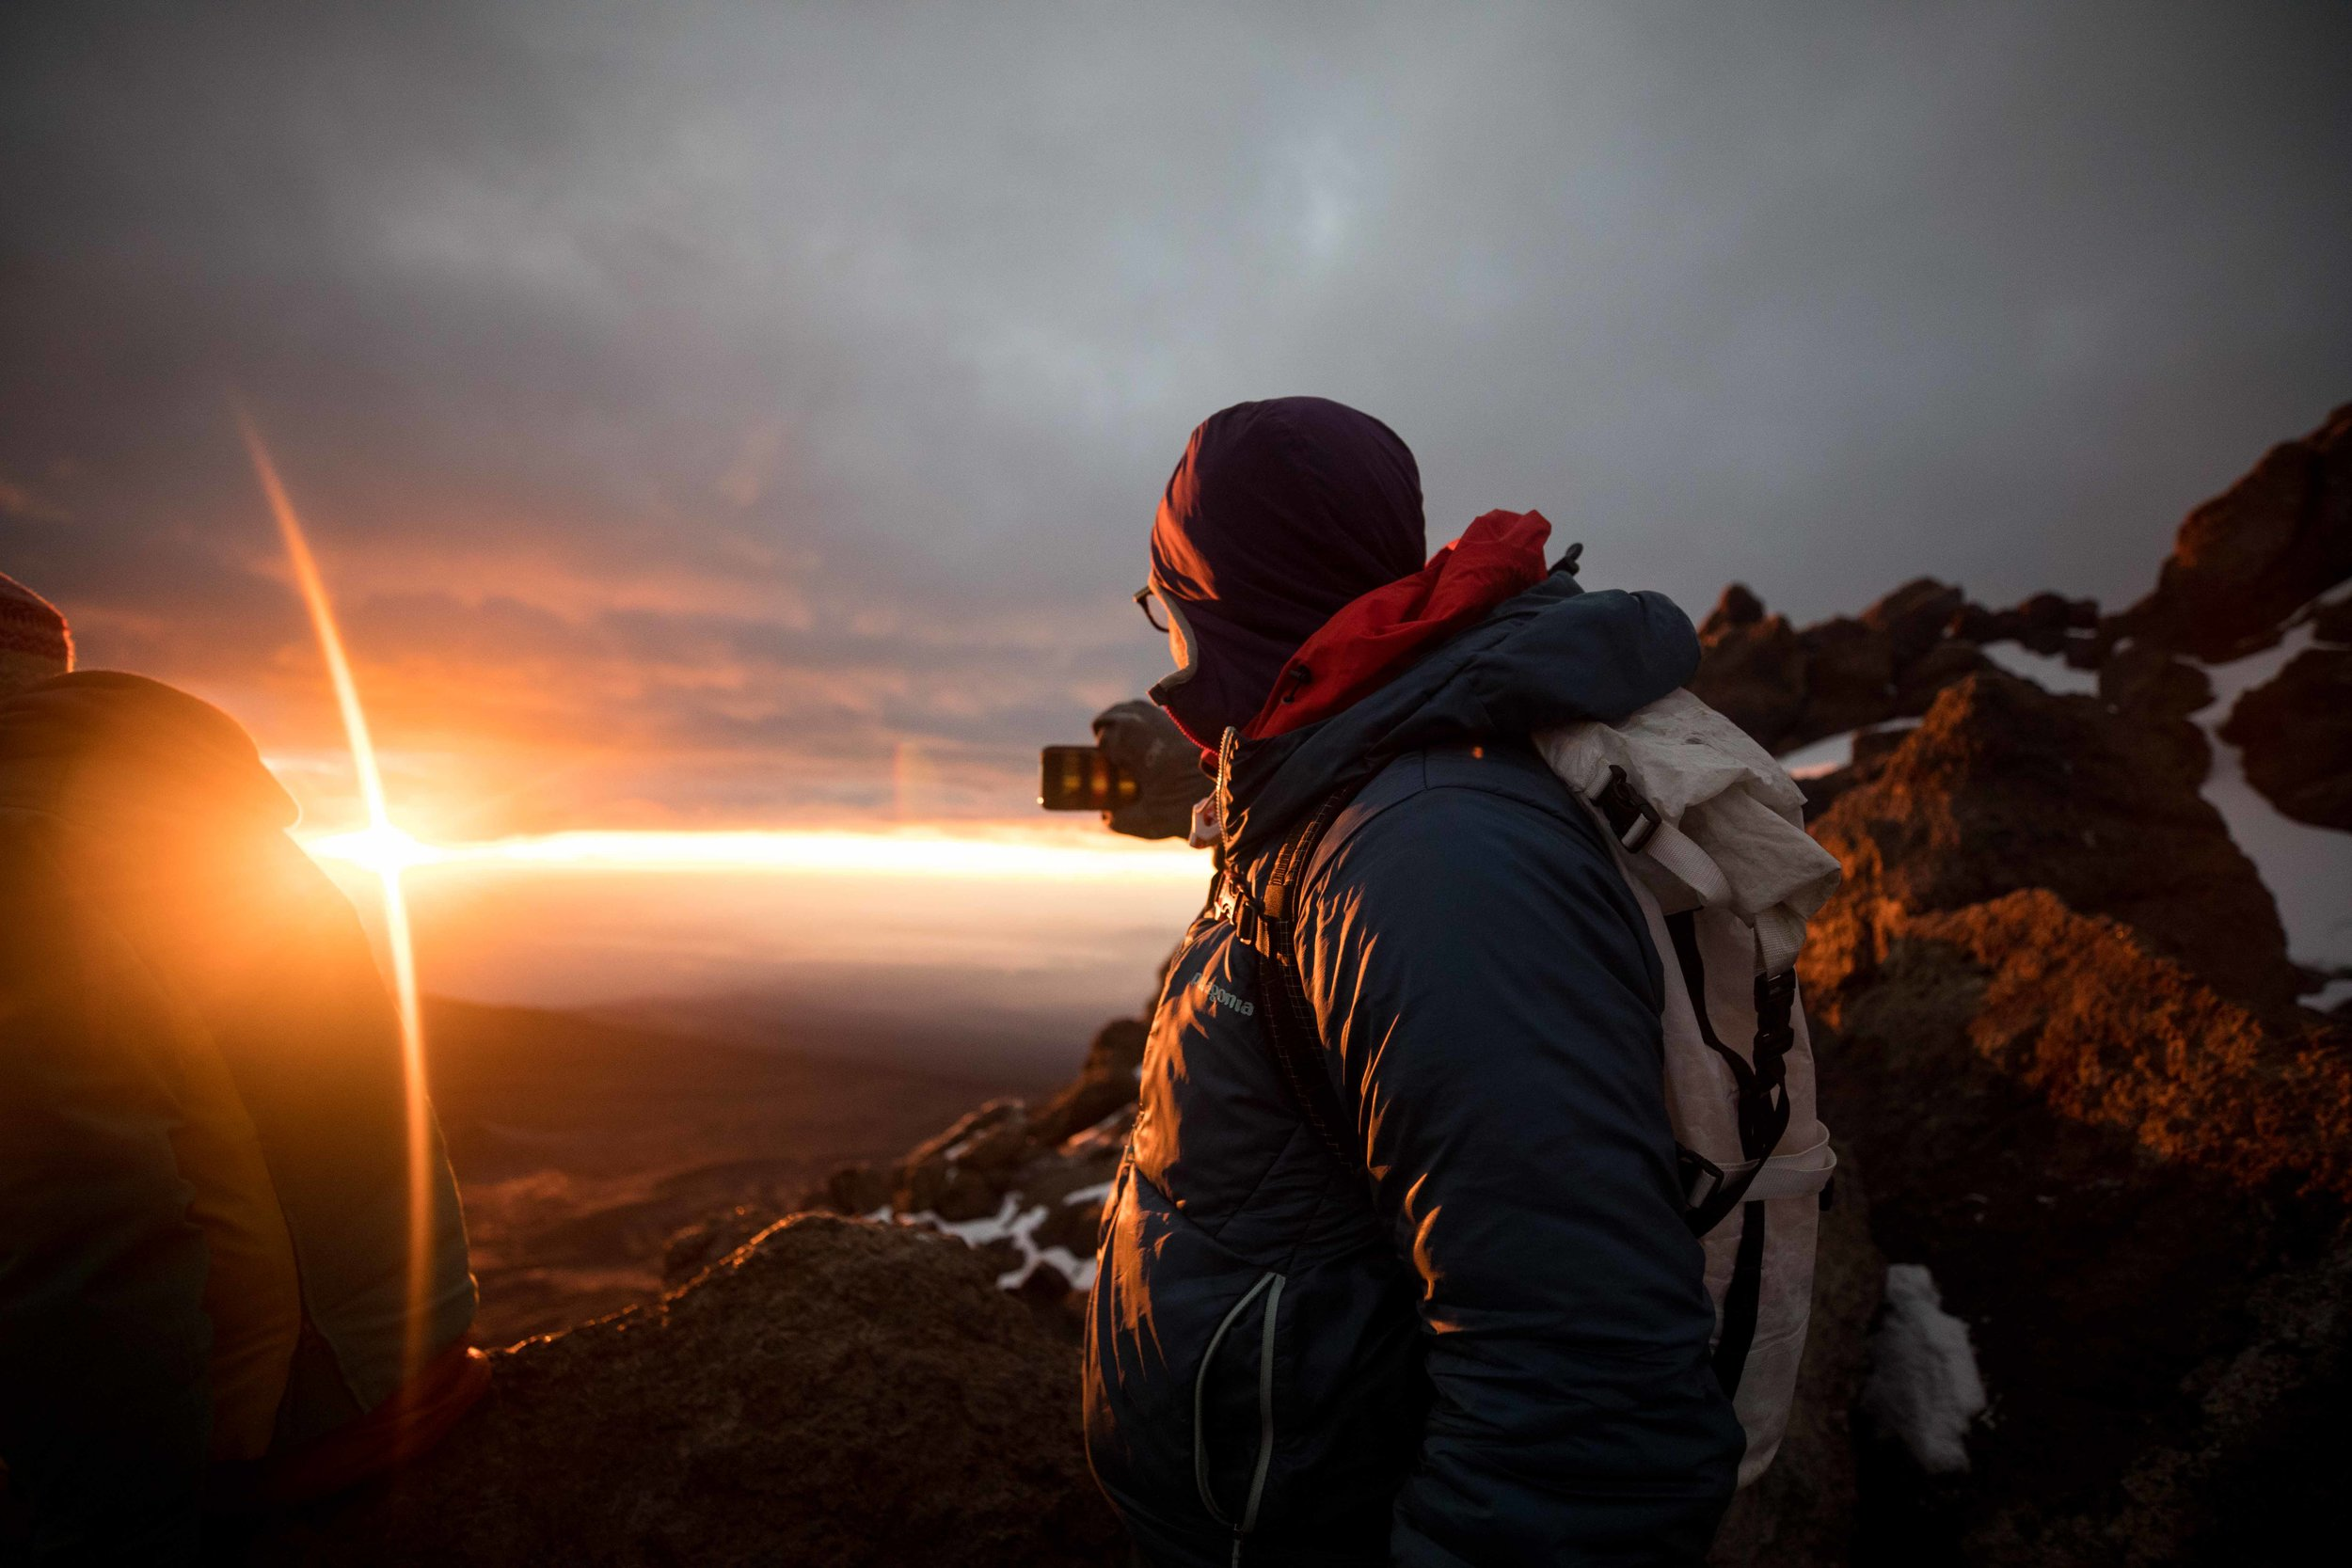 ajw_REI_Kilimanjaro-46.jpg